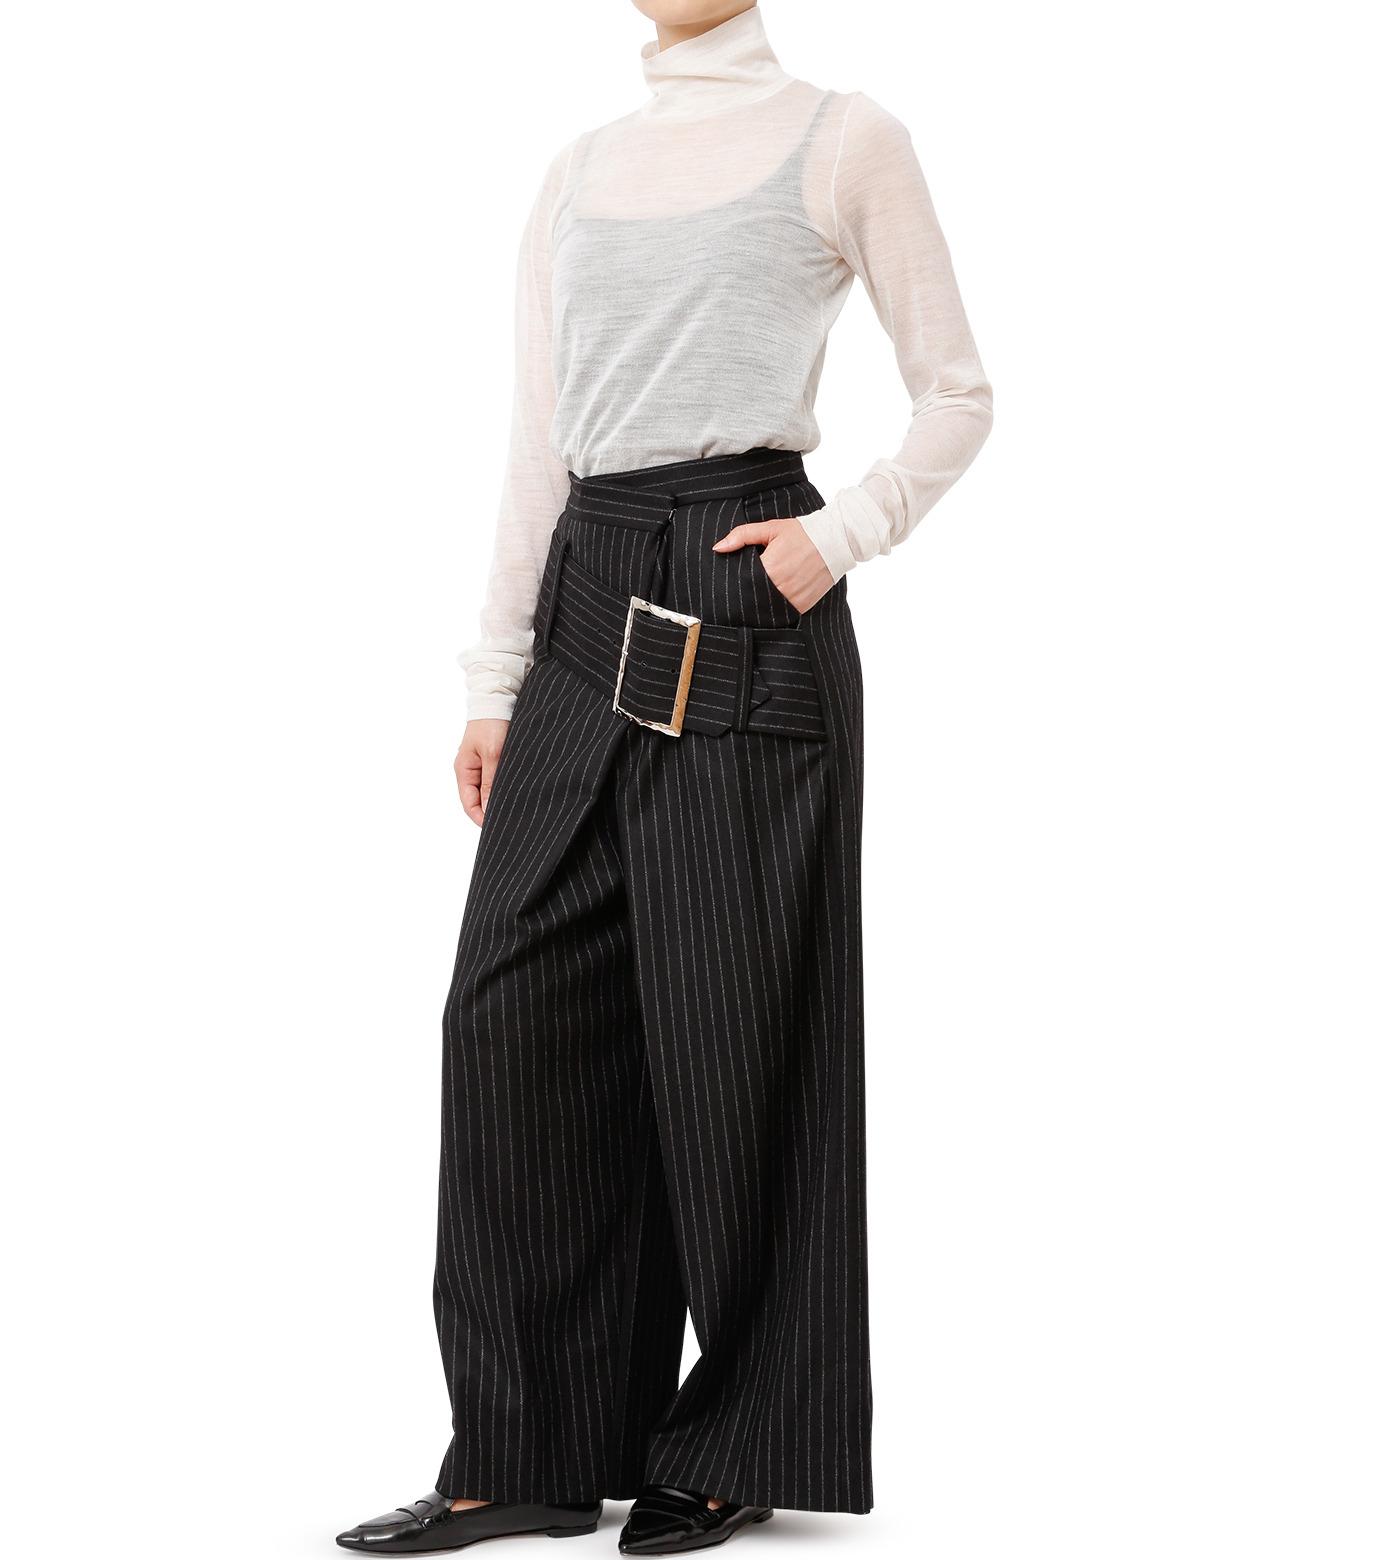 CHRISTIAN DADA(クリスチャン ダダ)のStriped Wideleg Trouser w/Buckle-BLACK(パンツ/pants)-16W-D-0607-13 拡大詳細画像3